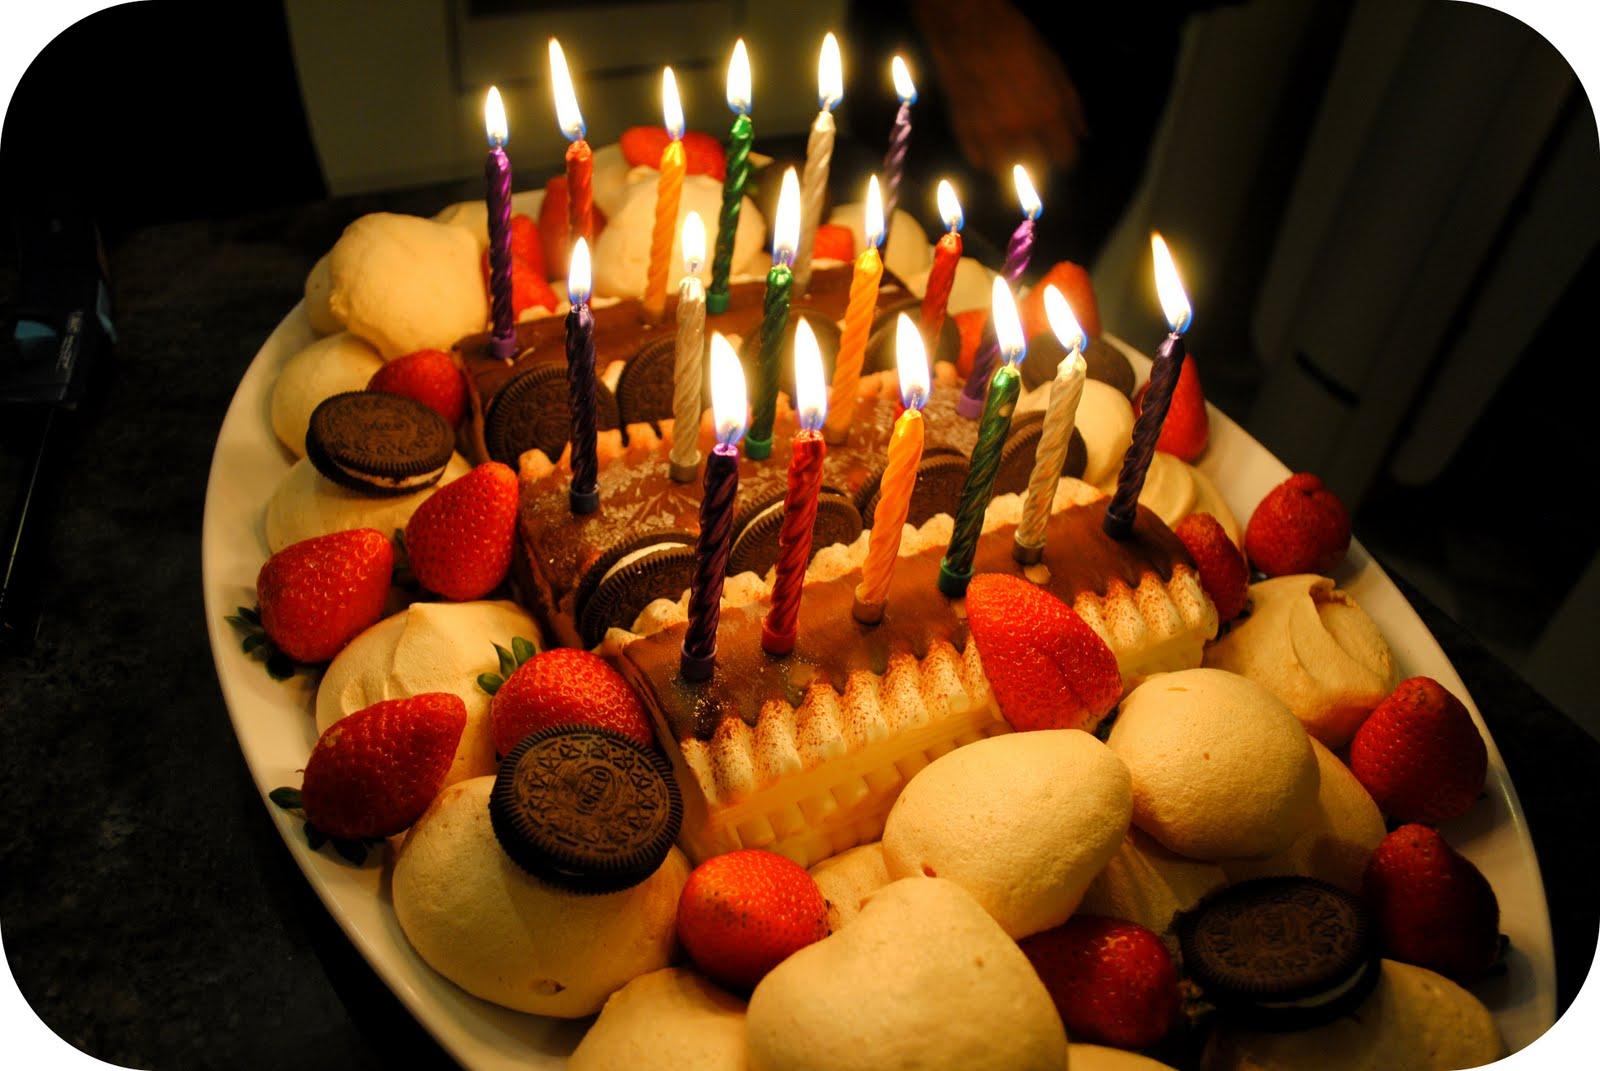 Birthday Cake For Brother Birthday season